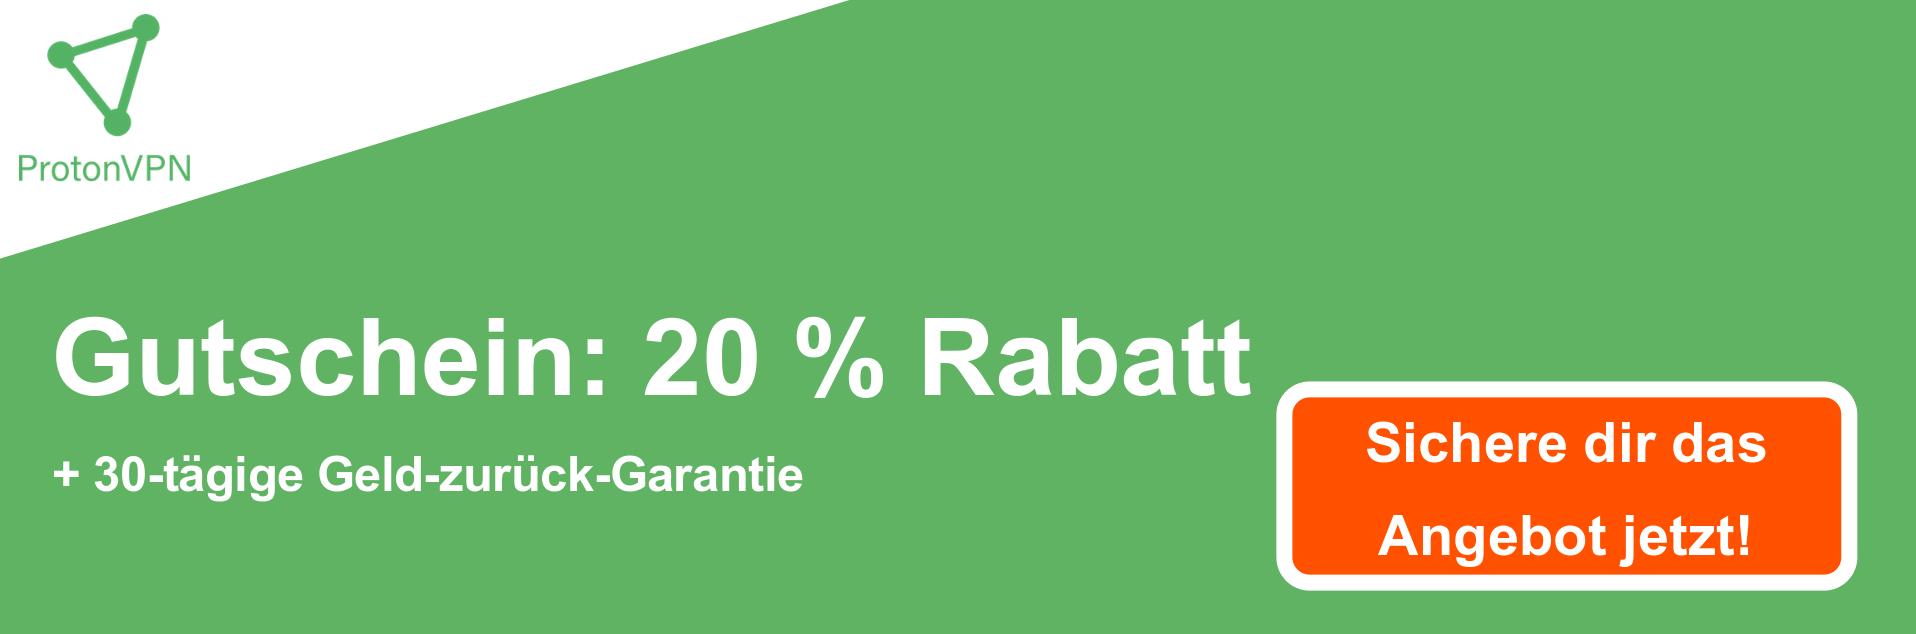 Proton VPN Coupon Banner - 20% Rabatt